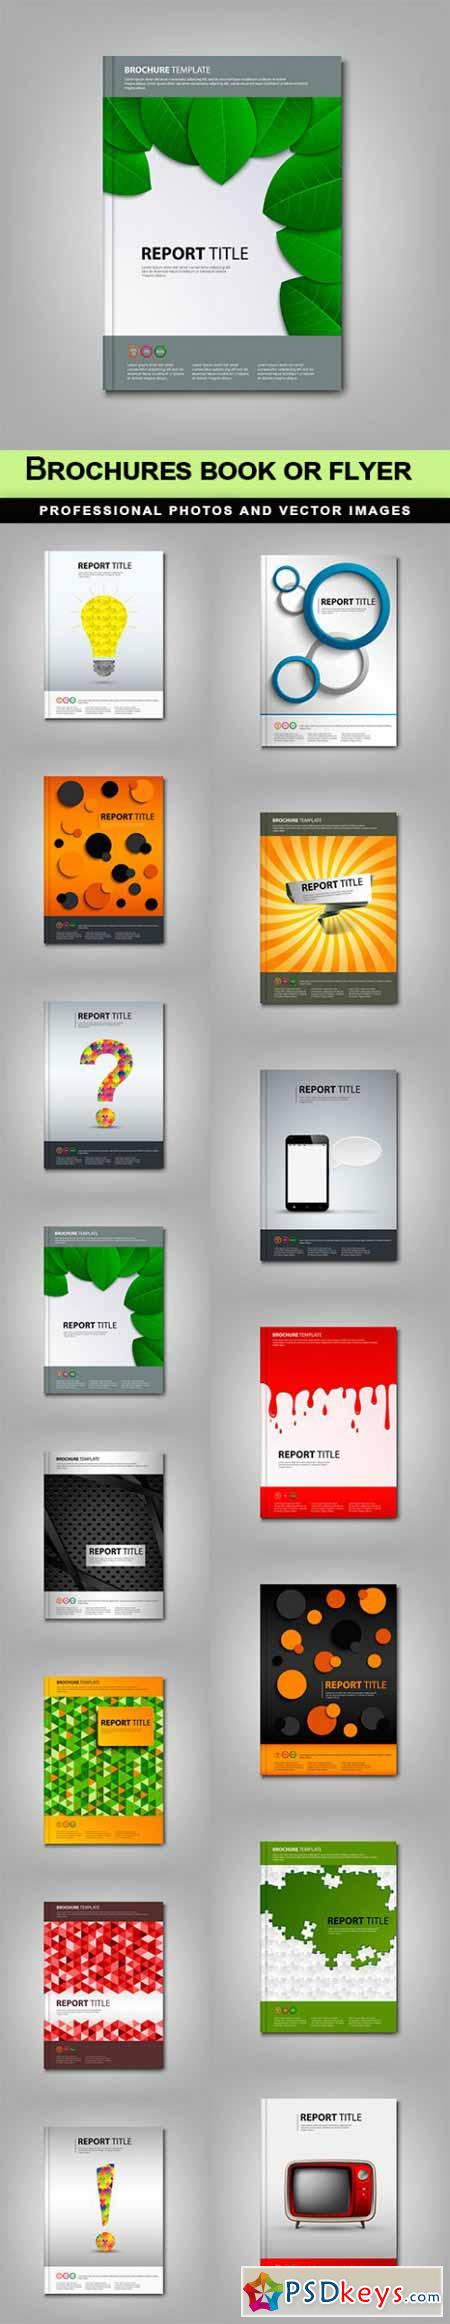 Brochures book or flyer - 15 EPS